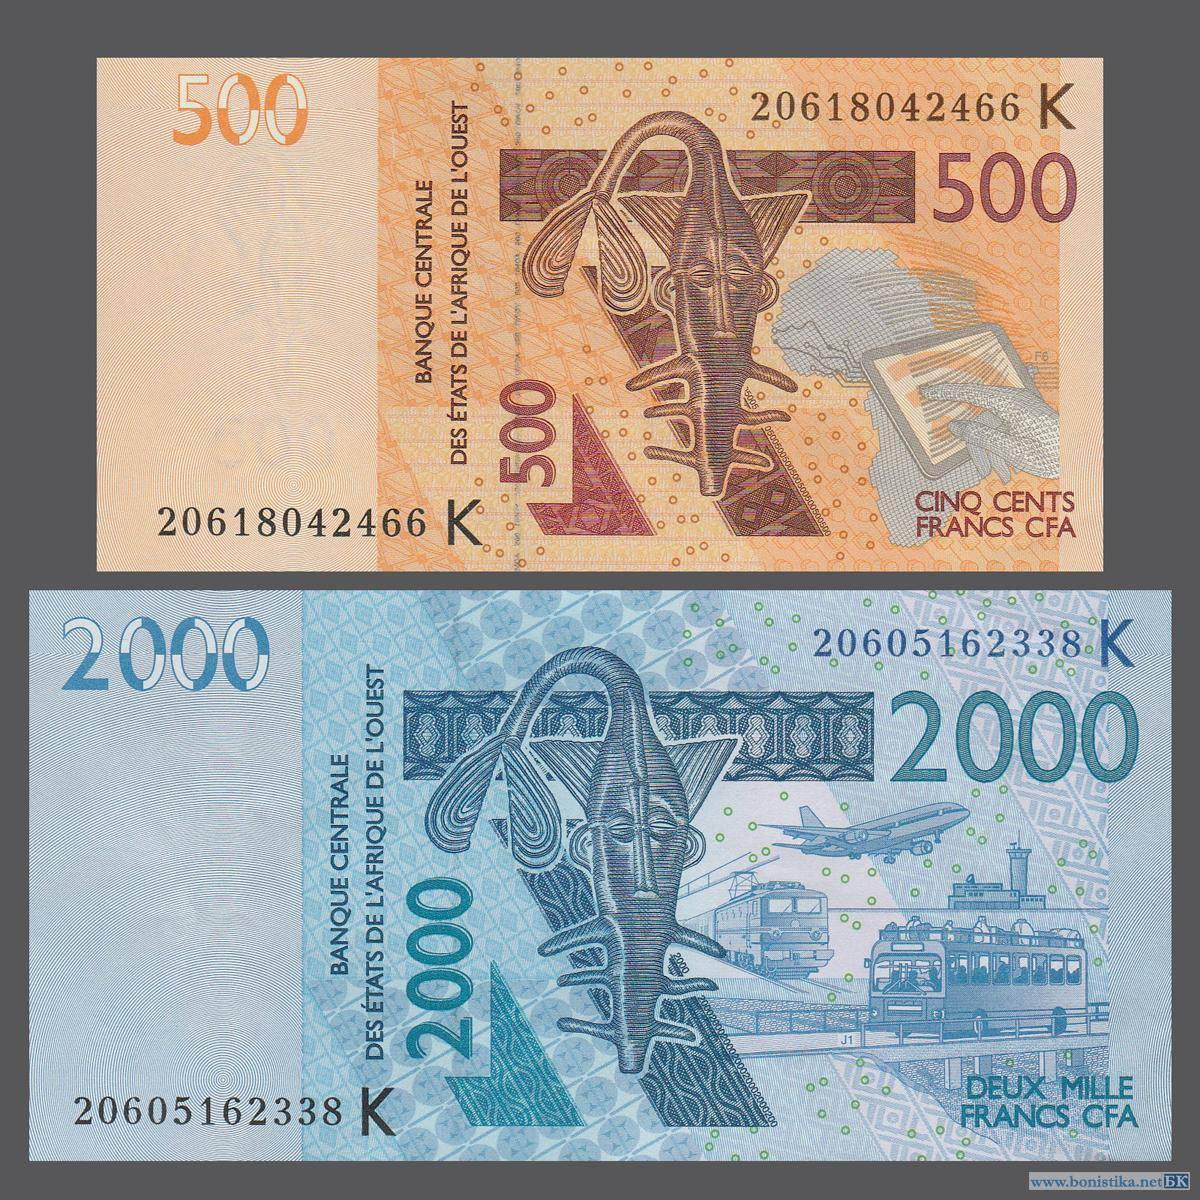 Английский фунт стерлингов: происхождение фунта